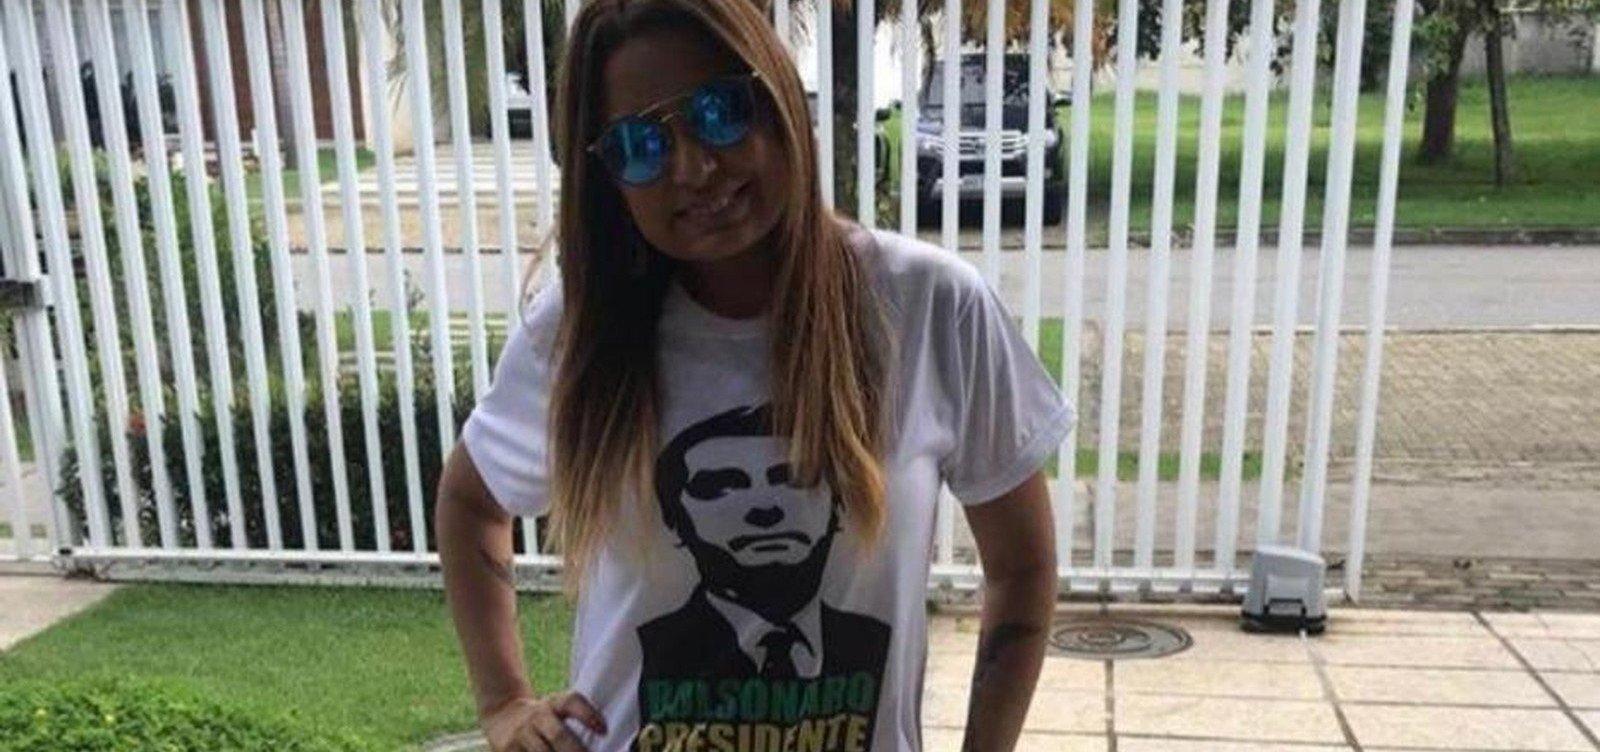 Promotora que declarou apoio a Bolsonaro nas eleições se afasta do caso Marielle